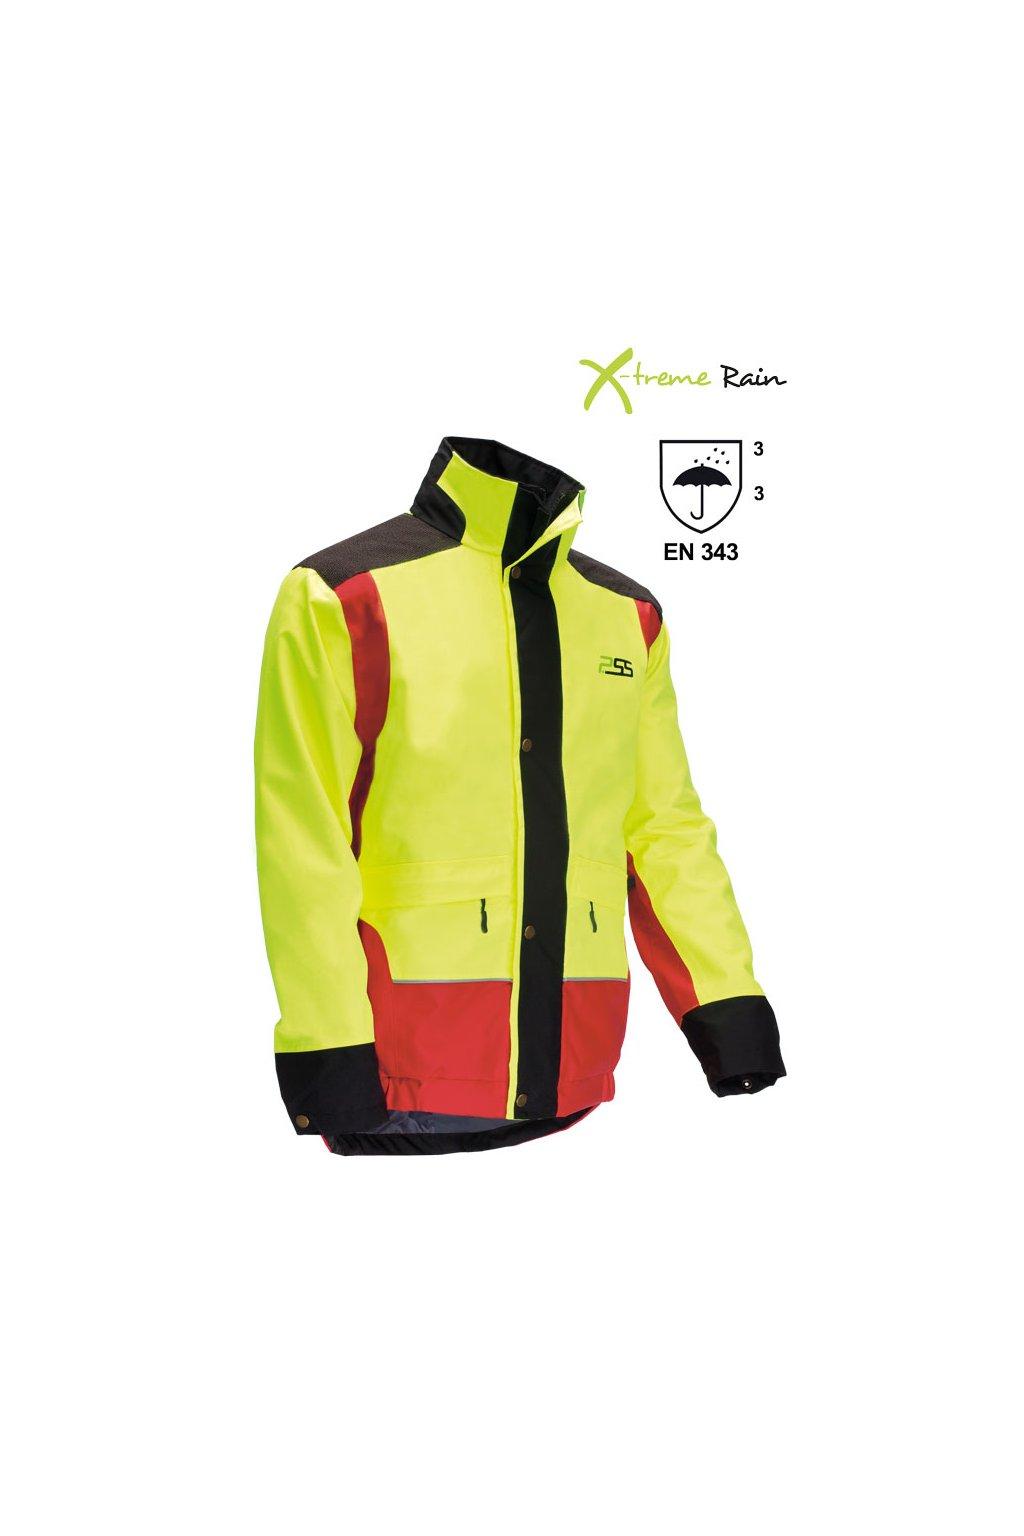 PSS - X-treme bunda ochranná proti dešti